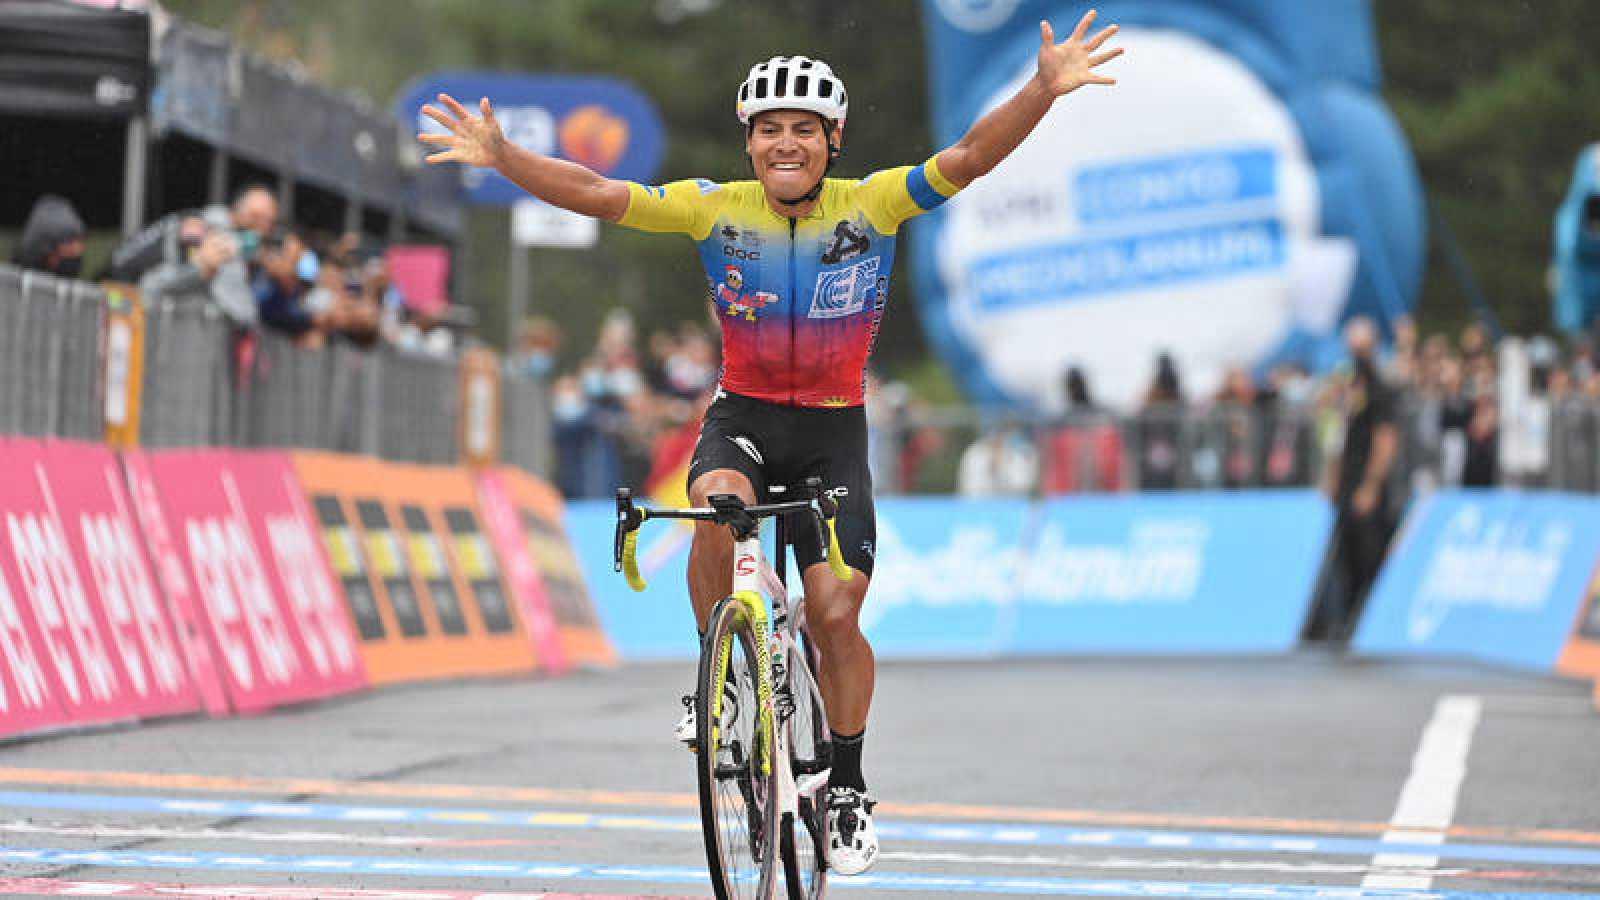 El ecuatoriano Jonathan Caicedo (Education First) se impone en la tercera etapa del Giro de Italia.